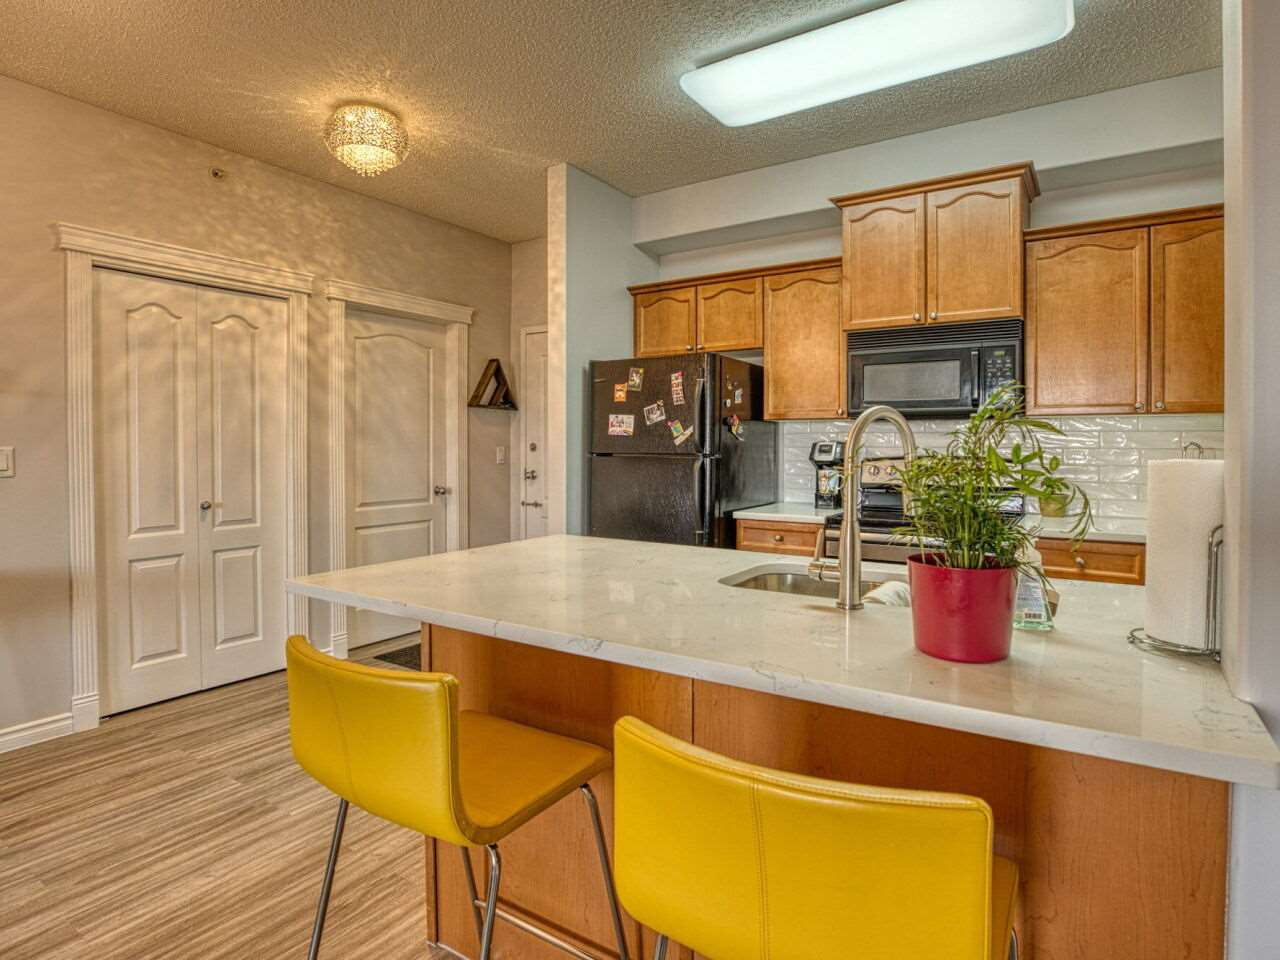 429 16807 100 Avenue - Glenwood_EDMO Lowrise Apartment for sale, 2 Bedrooms (E4234341) #8